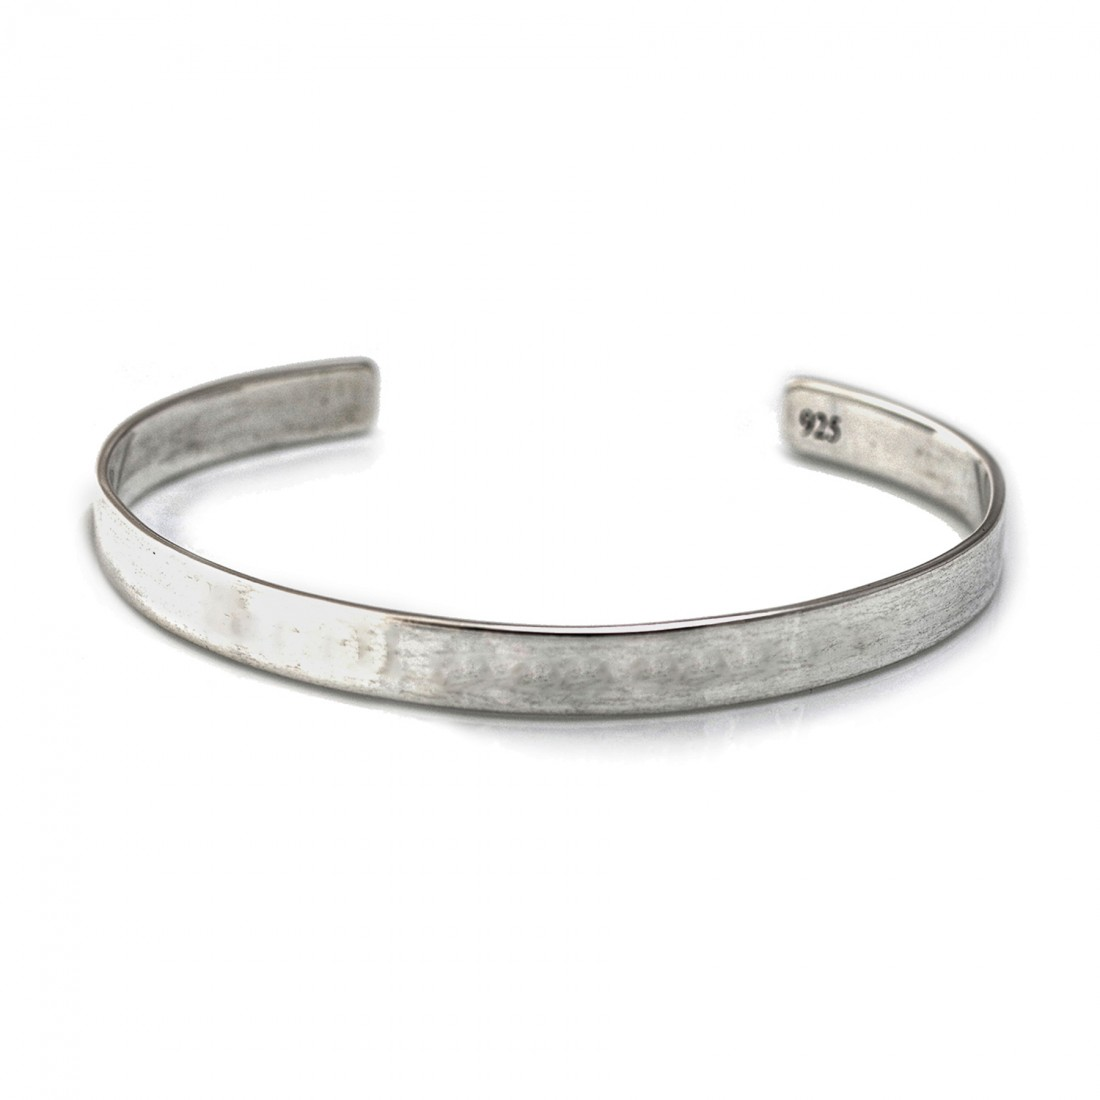 Sterling Silver Engravable Cuff Bracelet